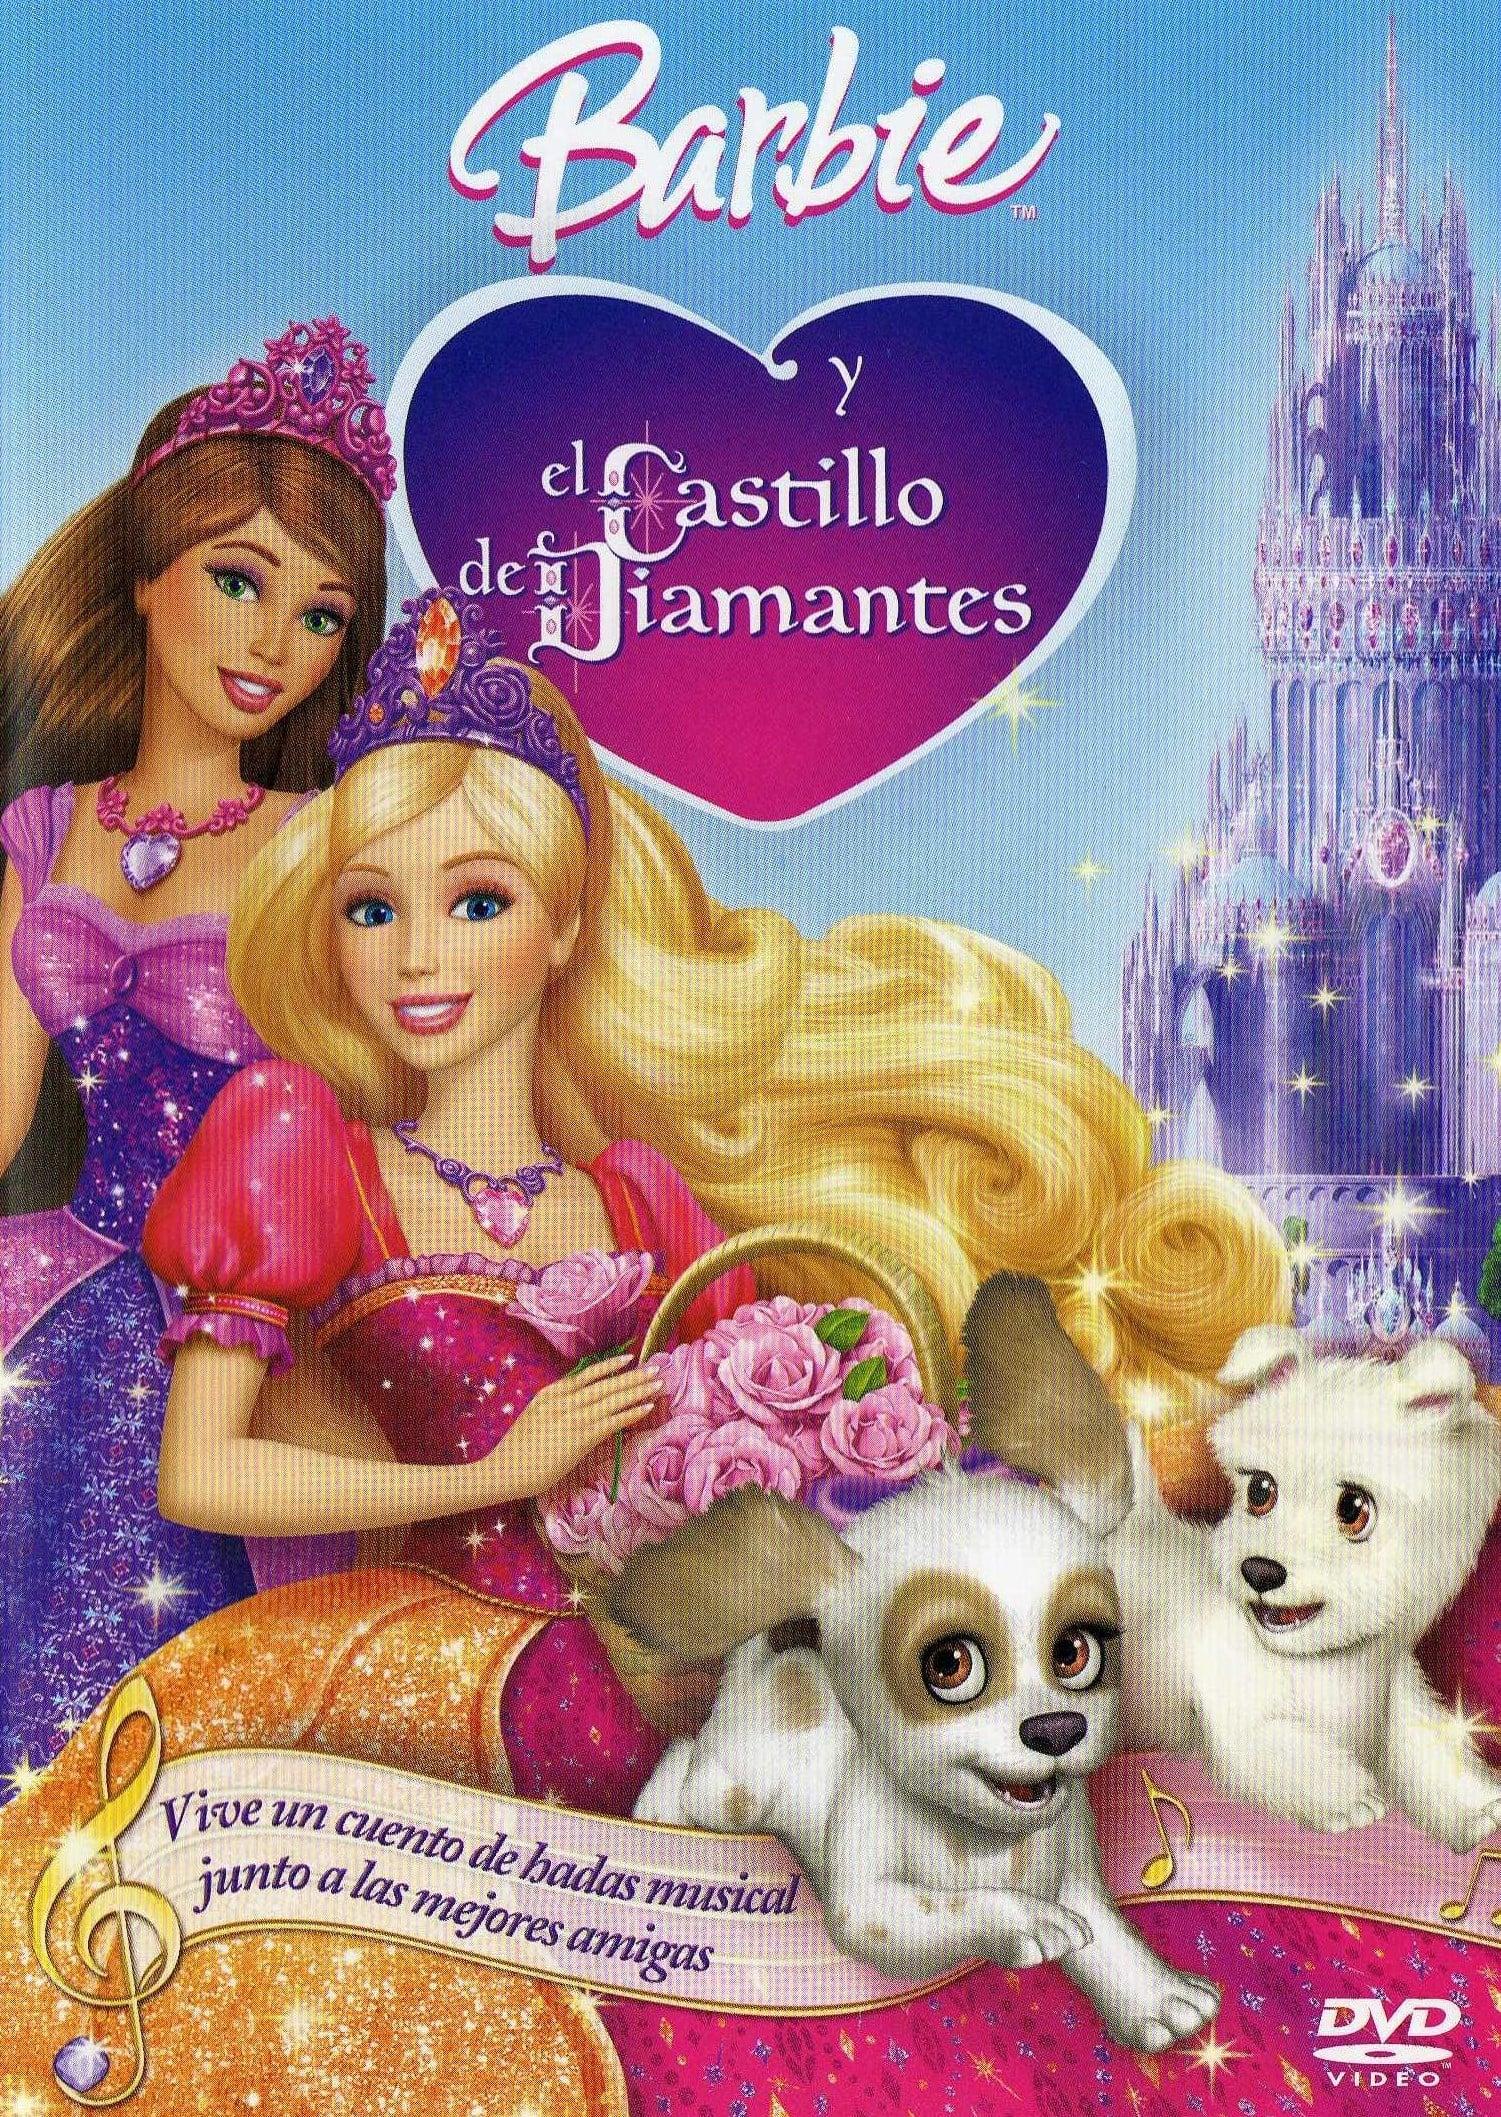 Watch Barbie and the Diamond Castle (2008) Full Movie Online Free - CineFOX